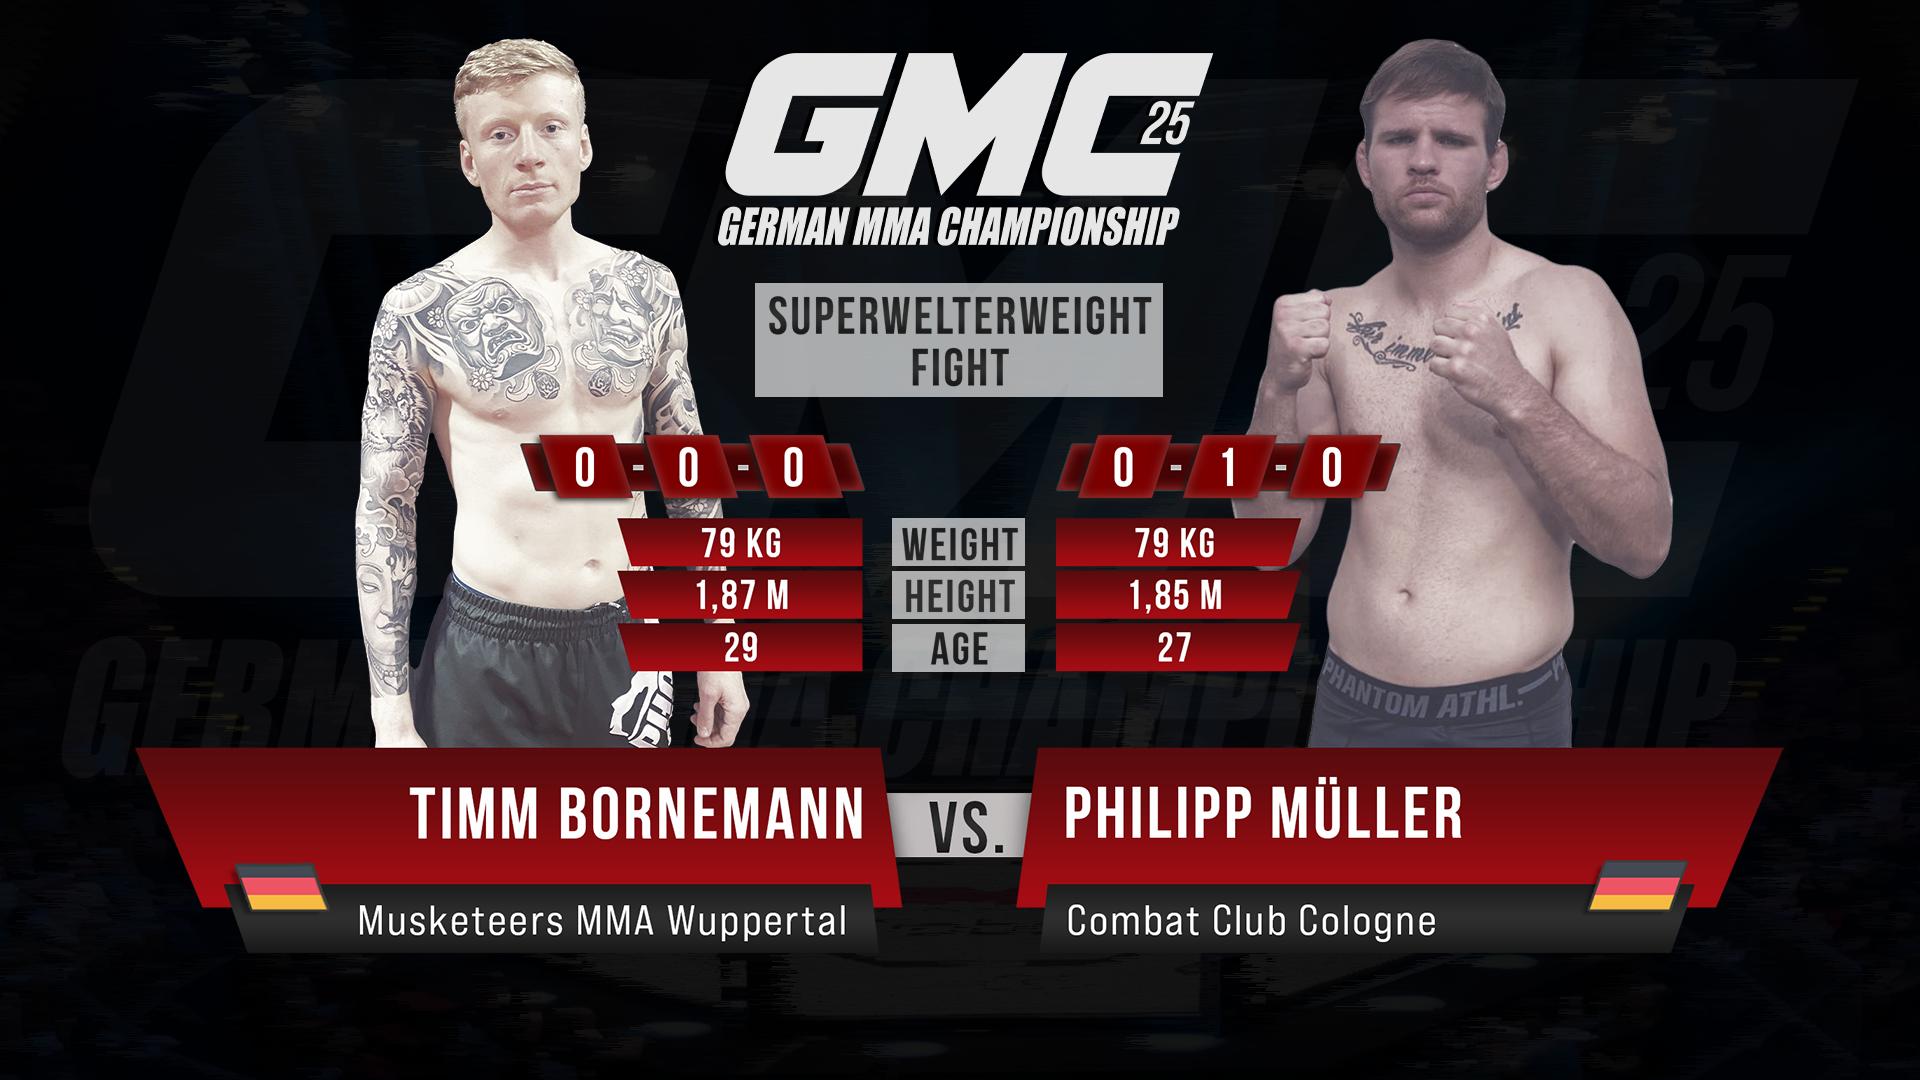 21.05.22 - bornemann vs Müller